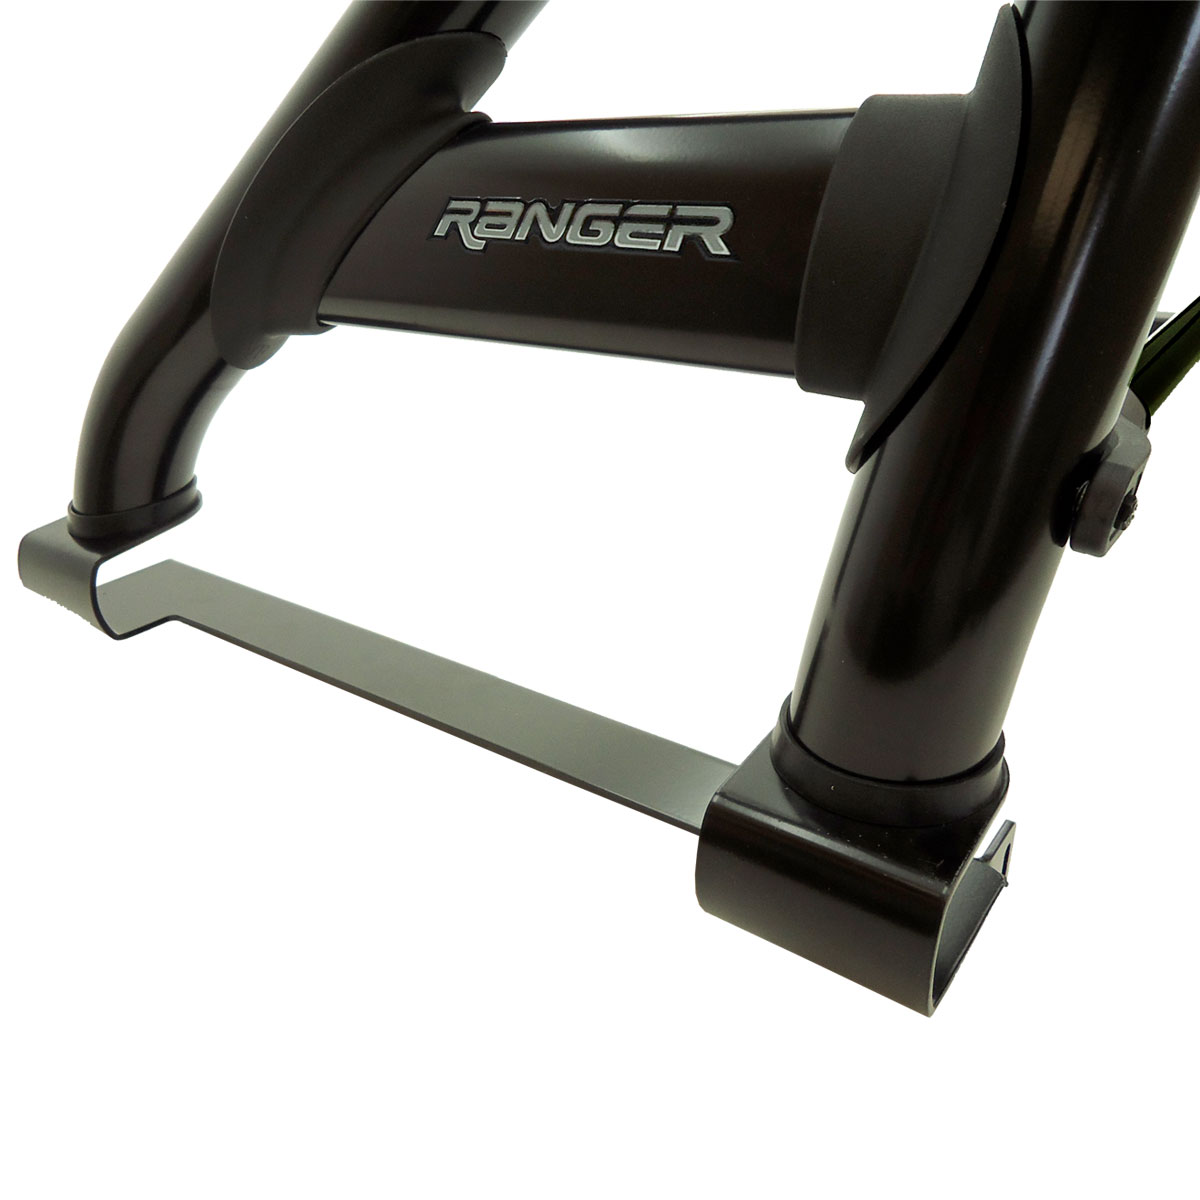 Santo antônio duplo preto Ranger 1994 a 2012 com barras de vidro